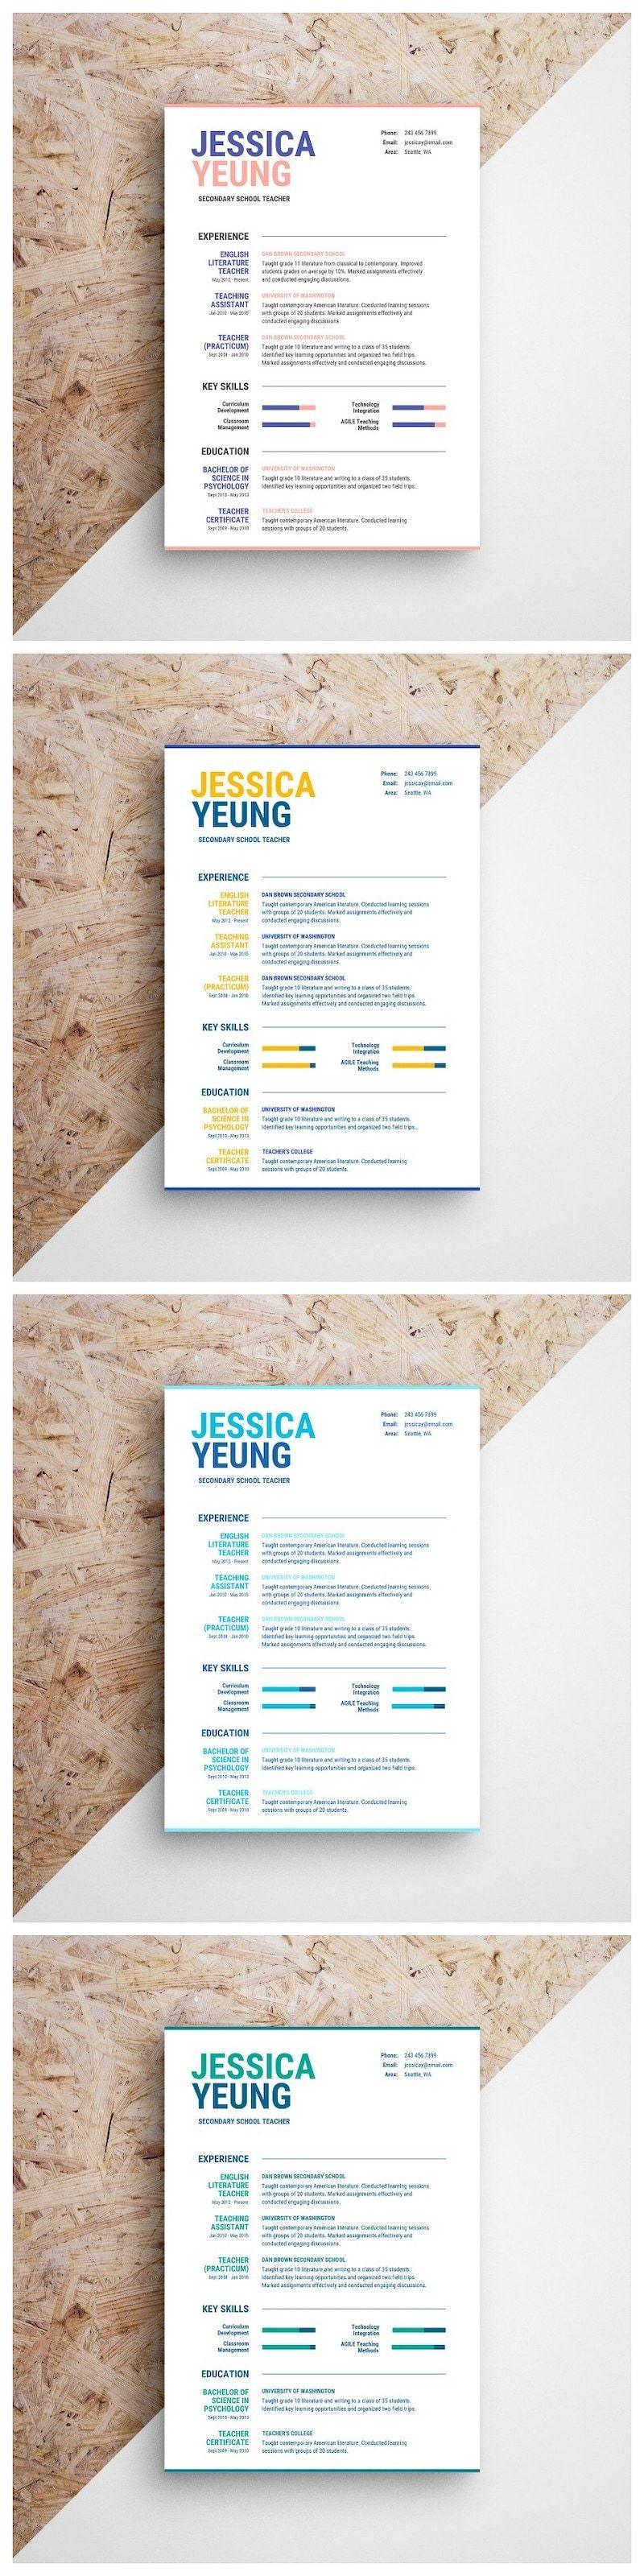 Formal resume resume design template resume design